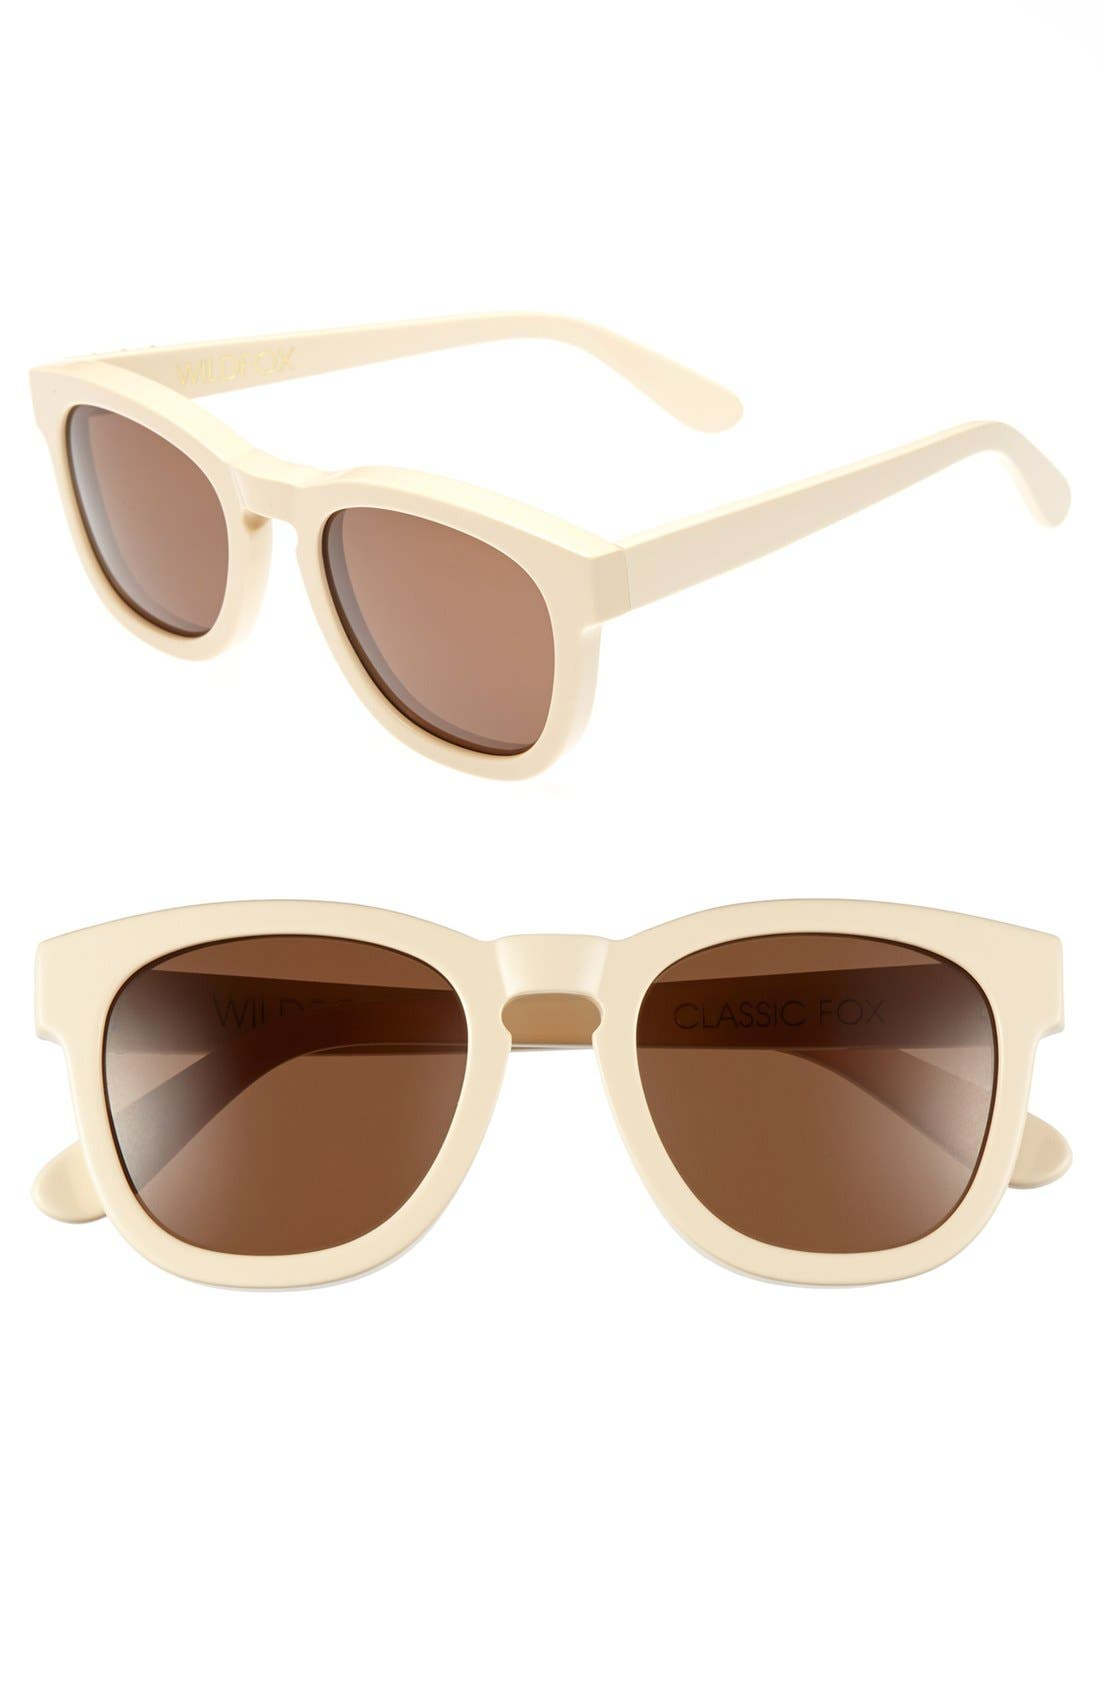 Main Image - Wildfox 'Juliet' Sunglasses